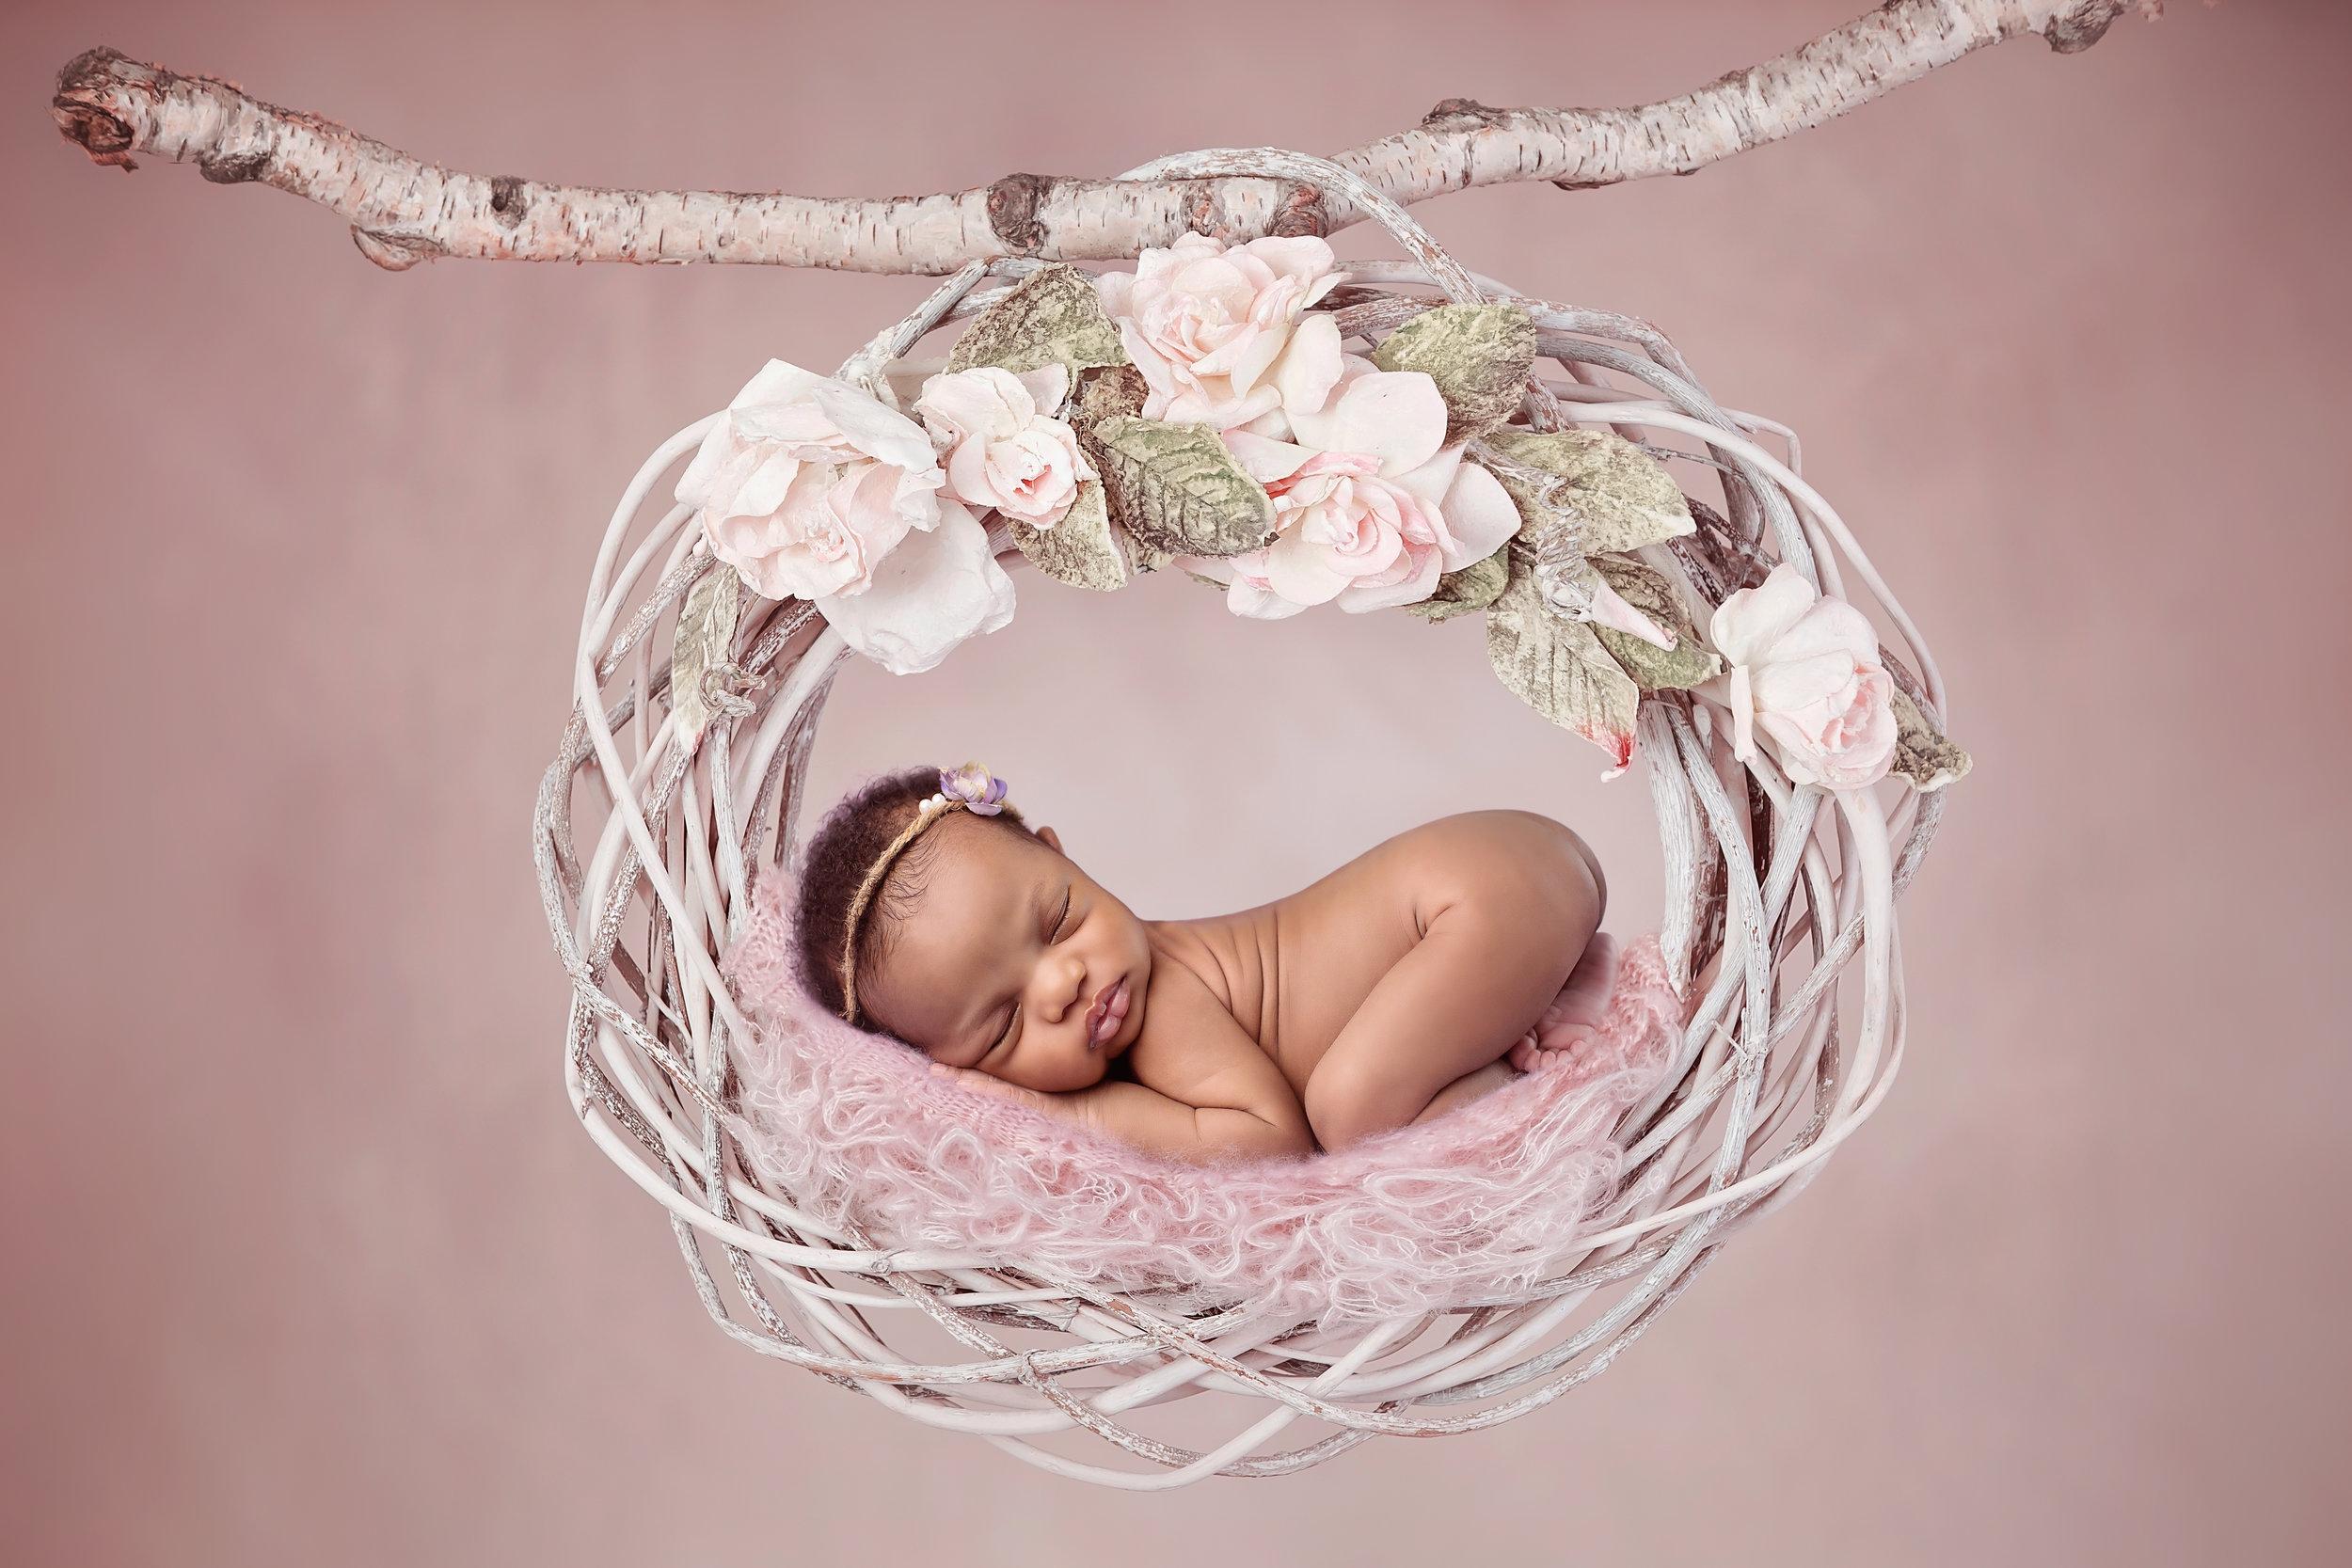 bianca-morello-photography-Rebecca-newborn-29.jpg